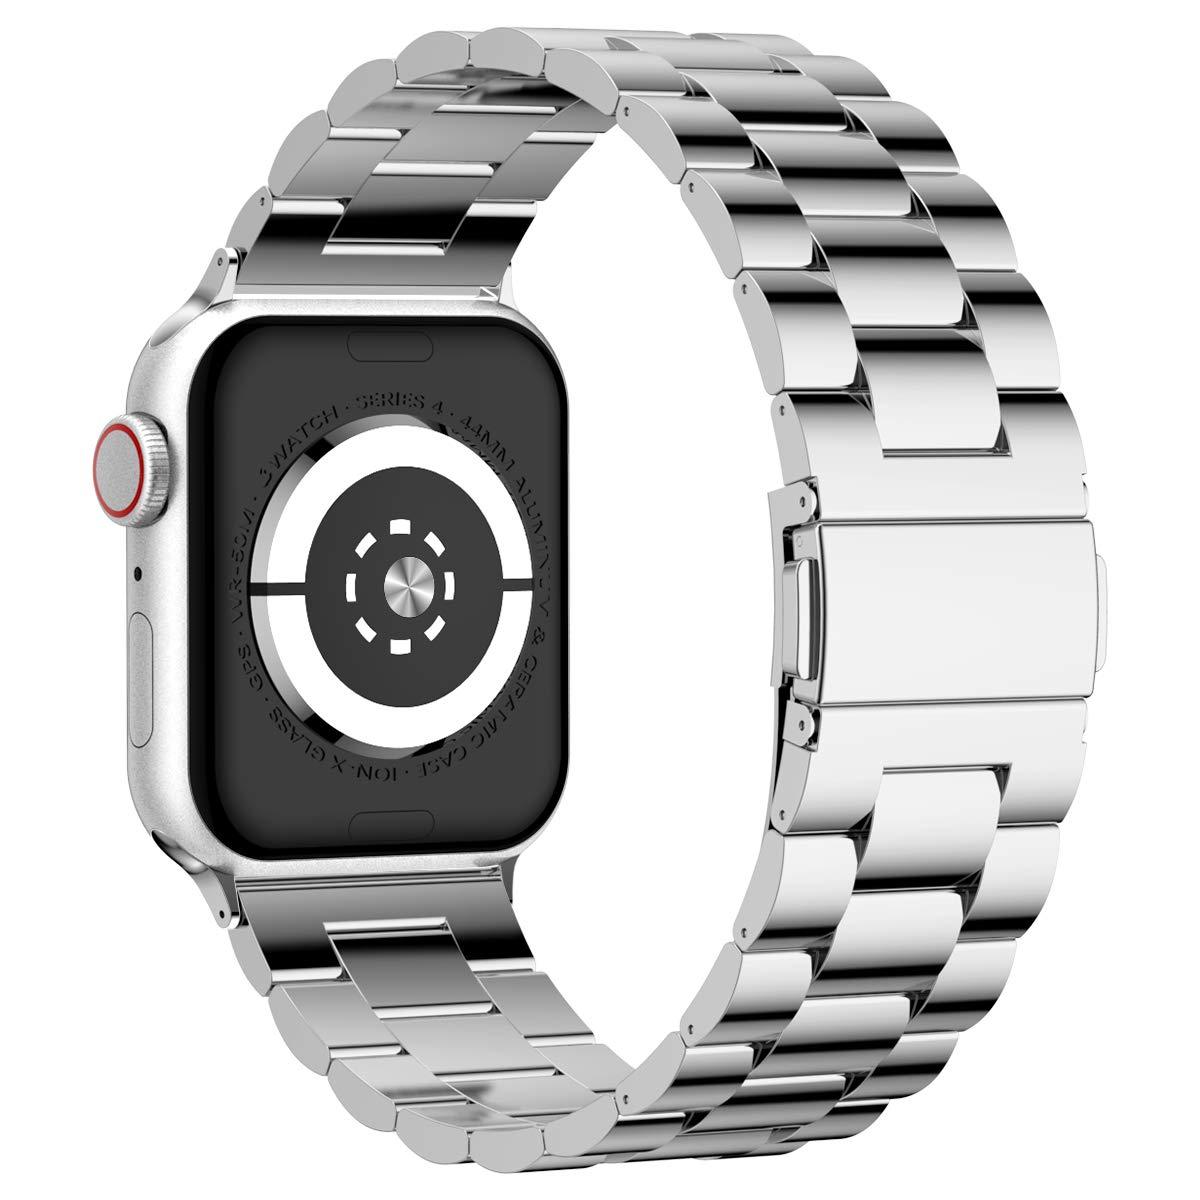 Malla Acero para Apple Watch (38/40mm) IITEEOLOGY [1ELEBLP8]